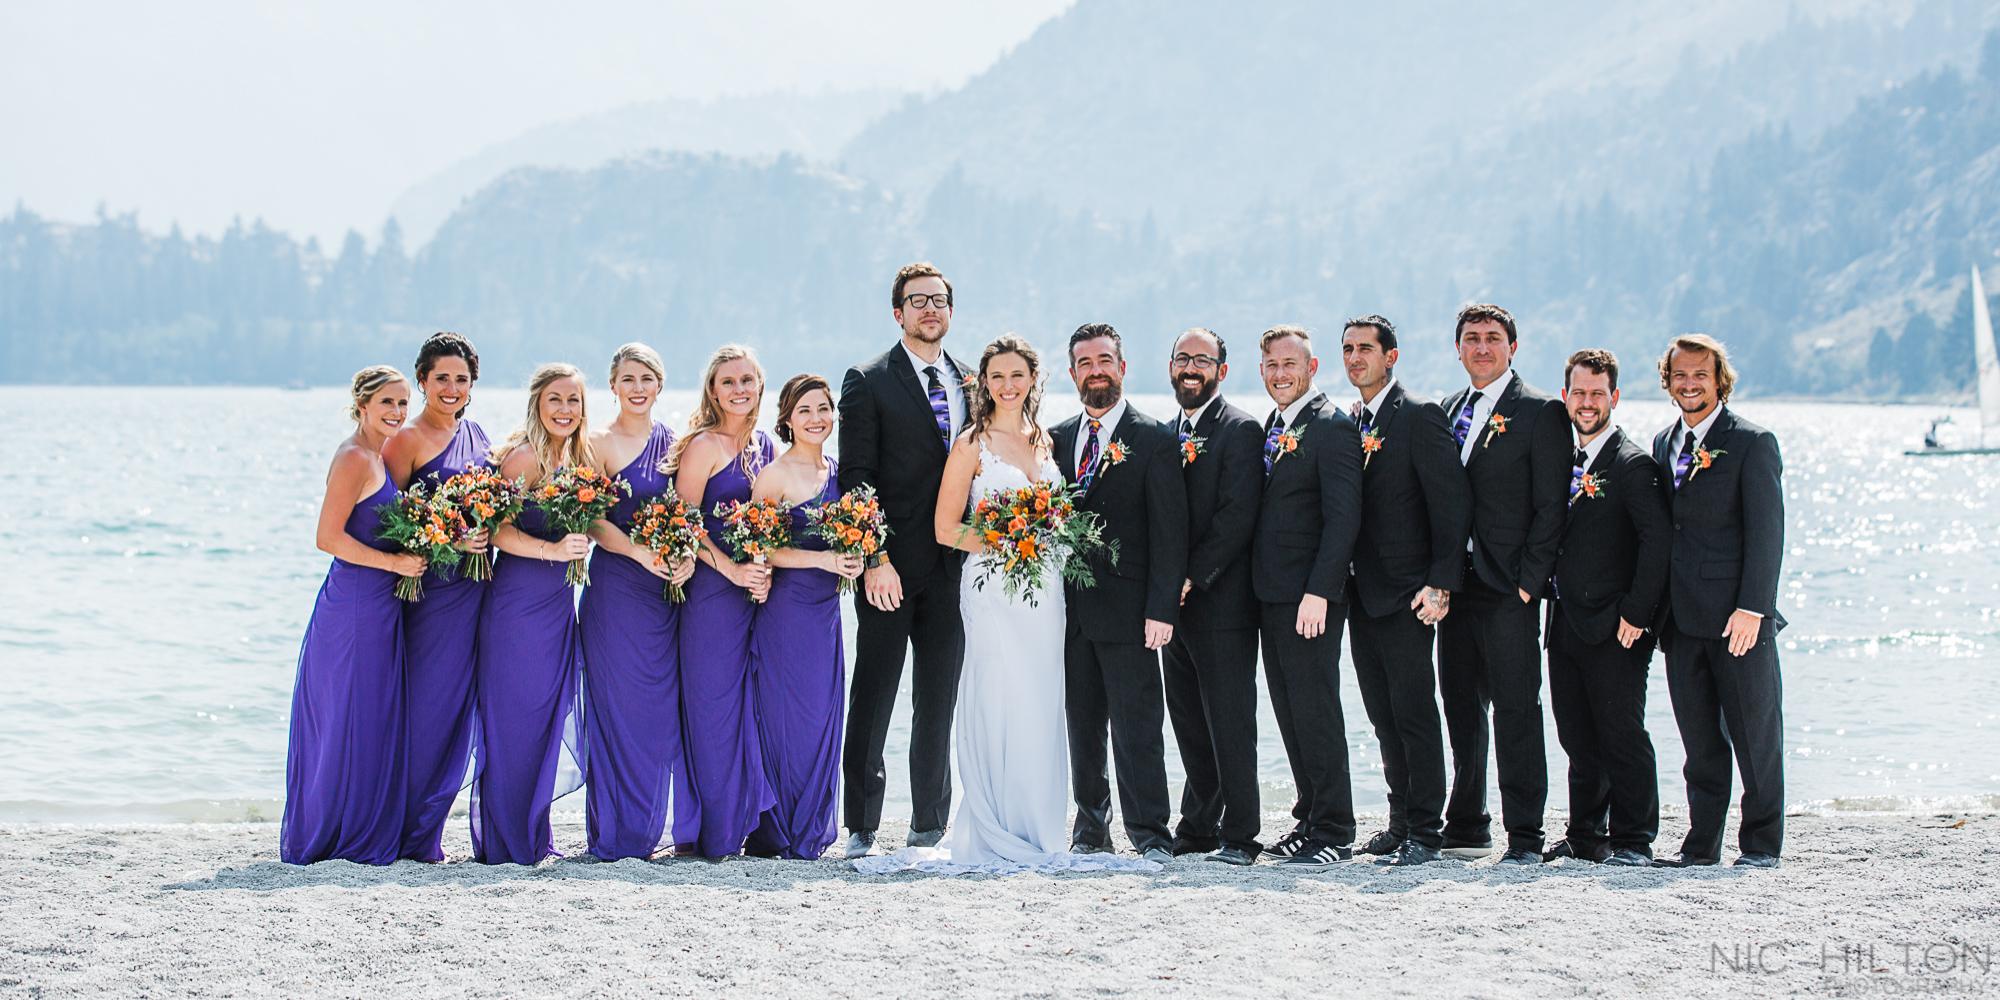 wedding-party-june-lake-wedding.jpg